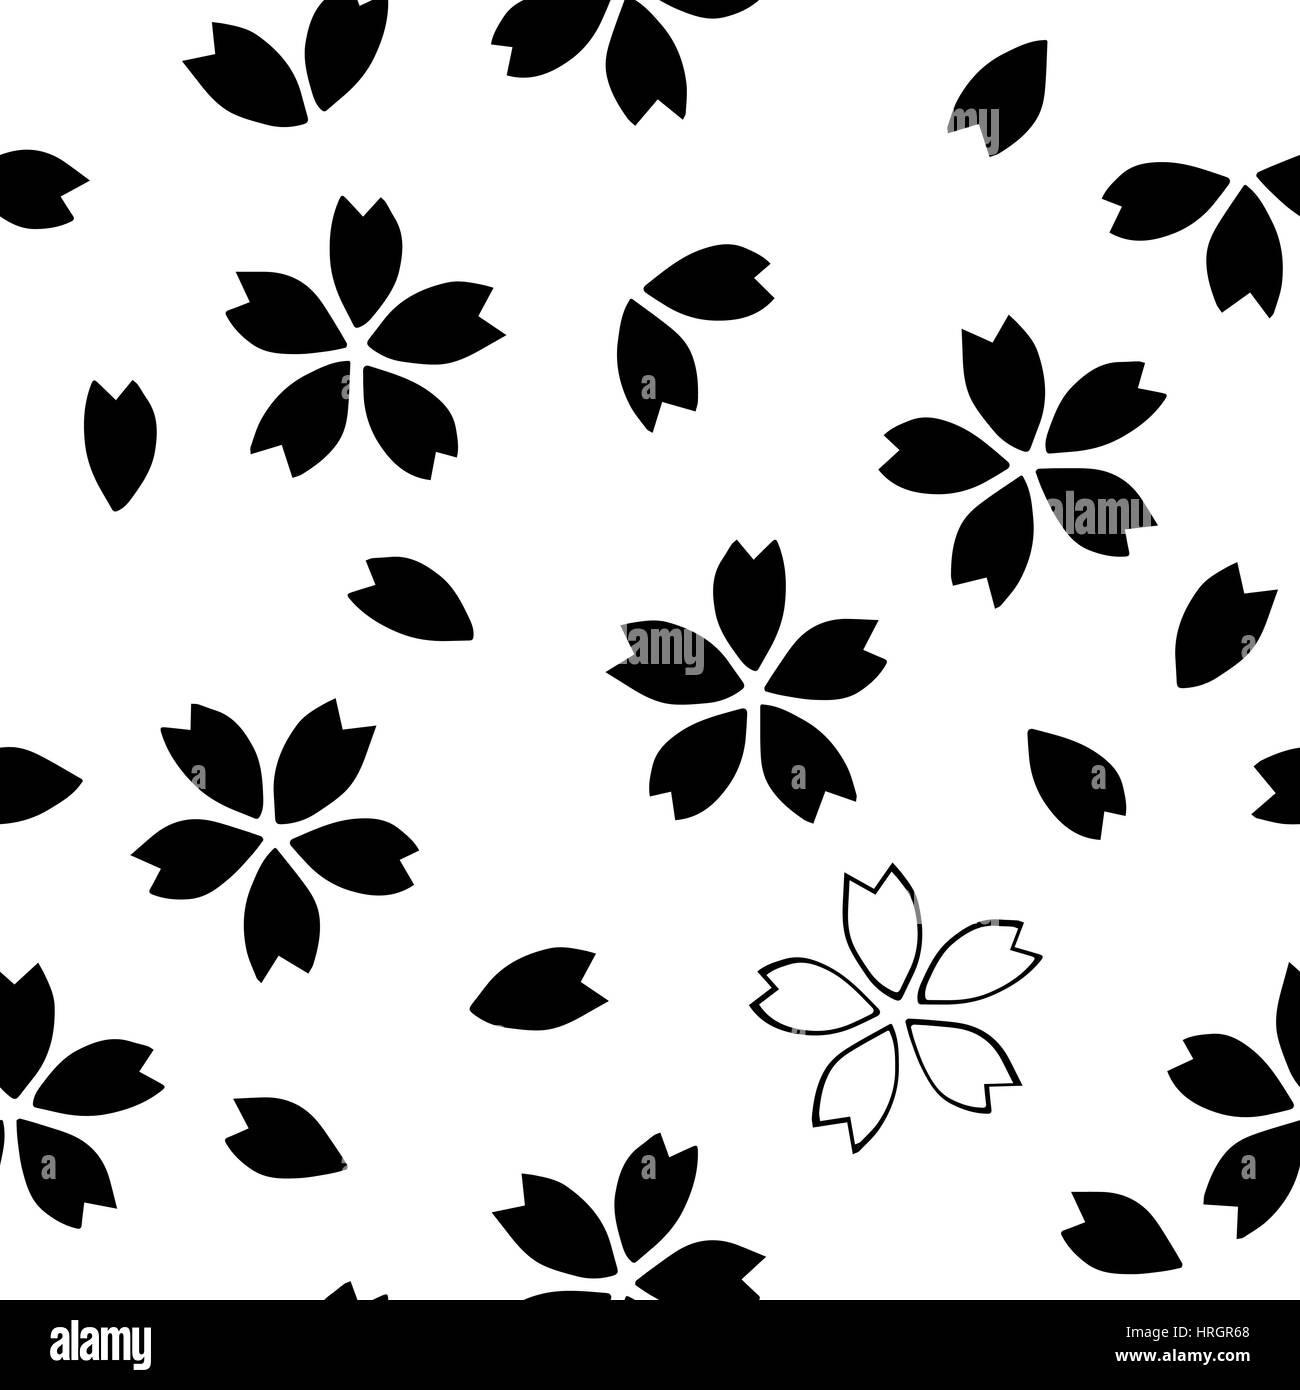 cherry blossom, black on white background. ethnic textile design